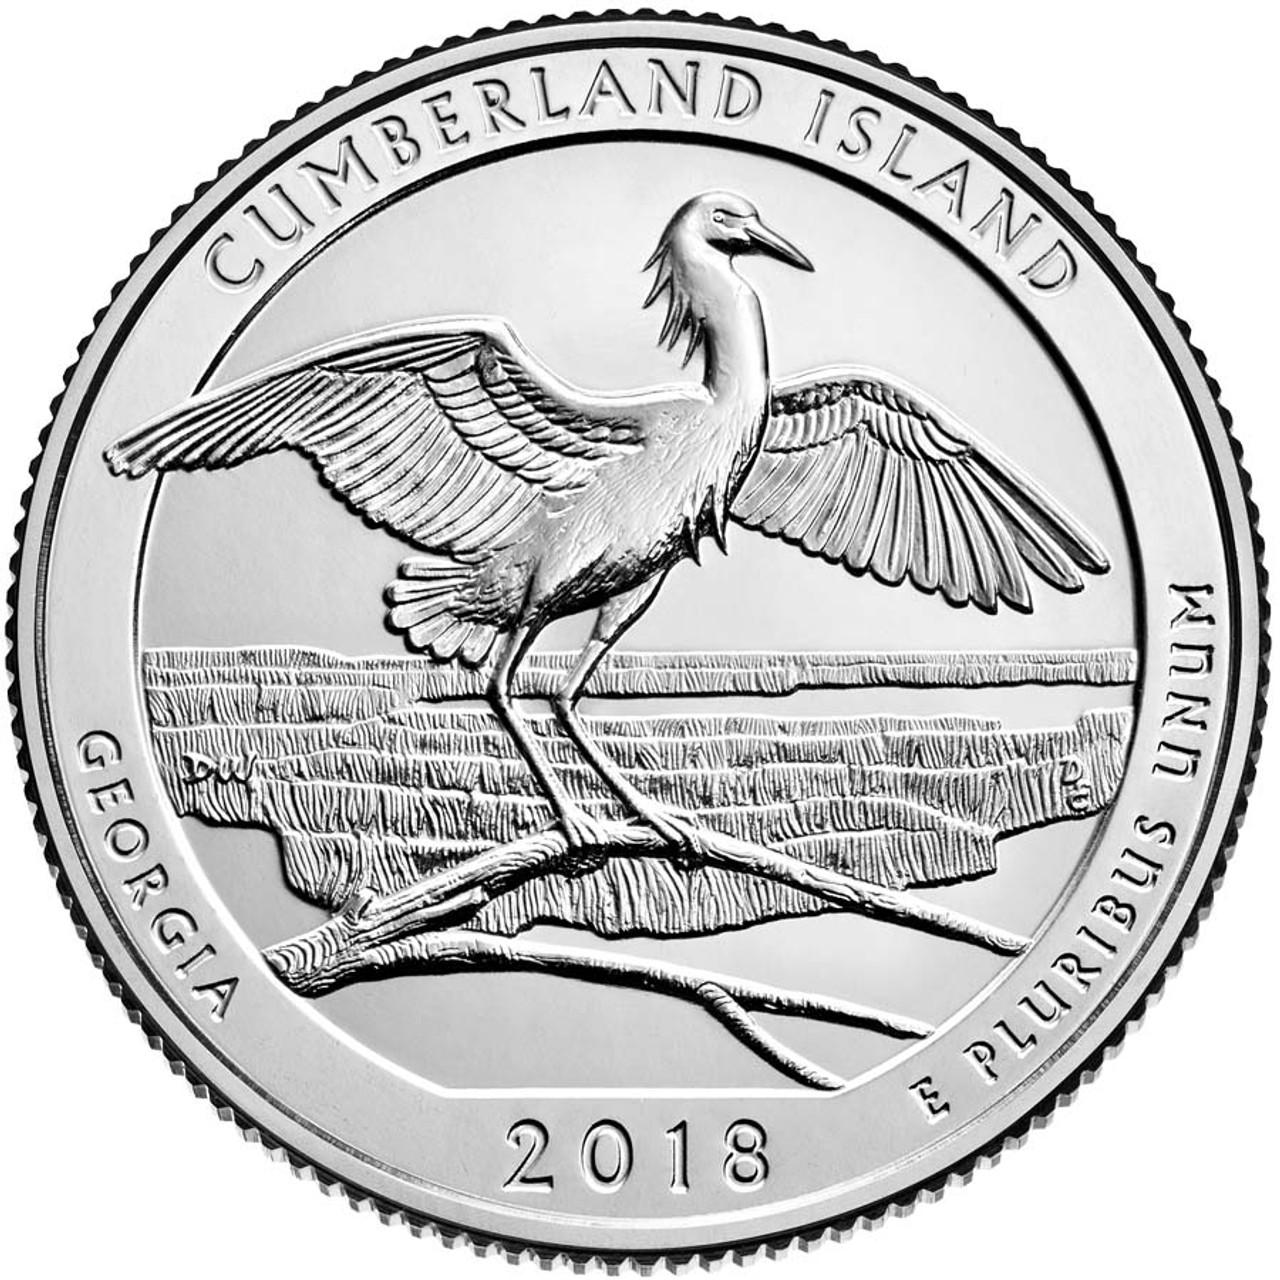 2018-D Cumberland Island National Seashore Quarter Brilliant Uncirculated Image 1